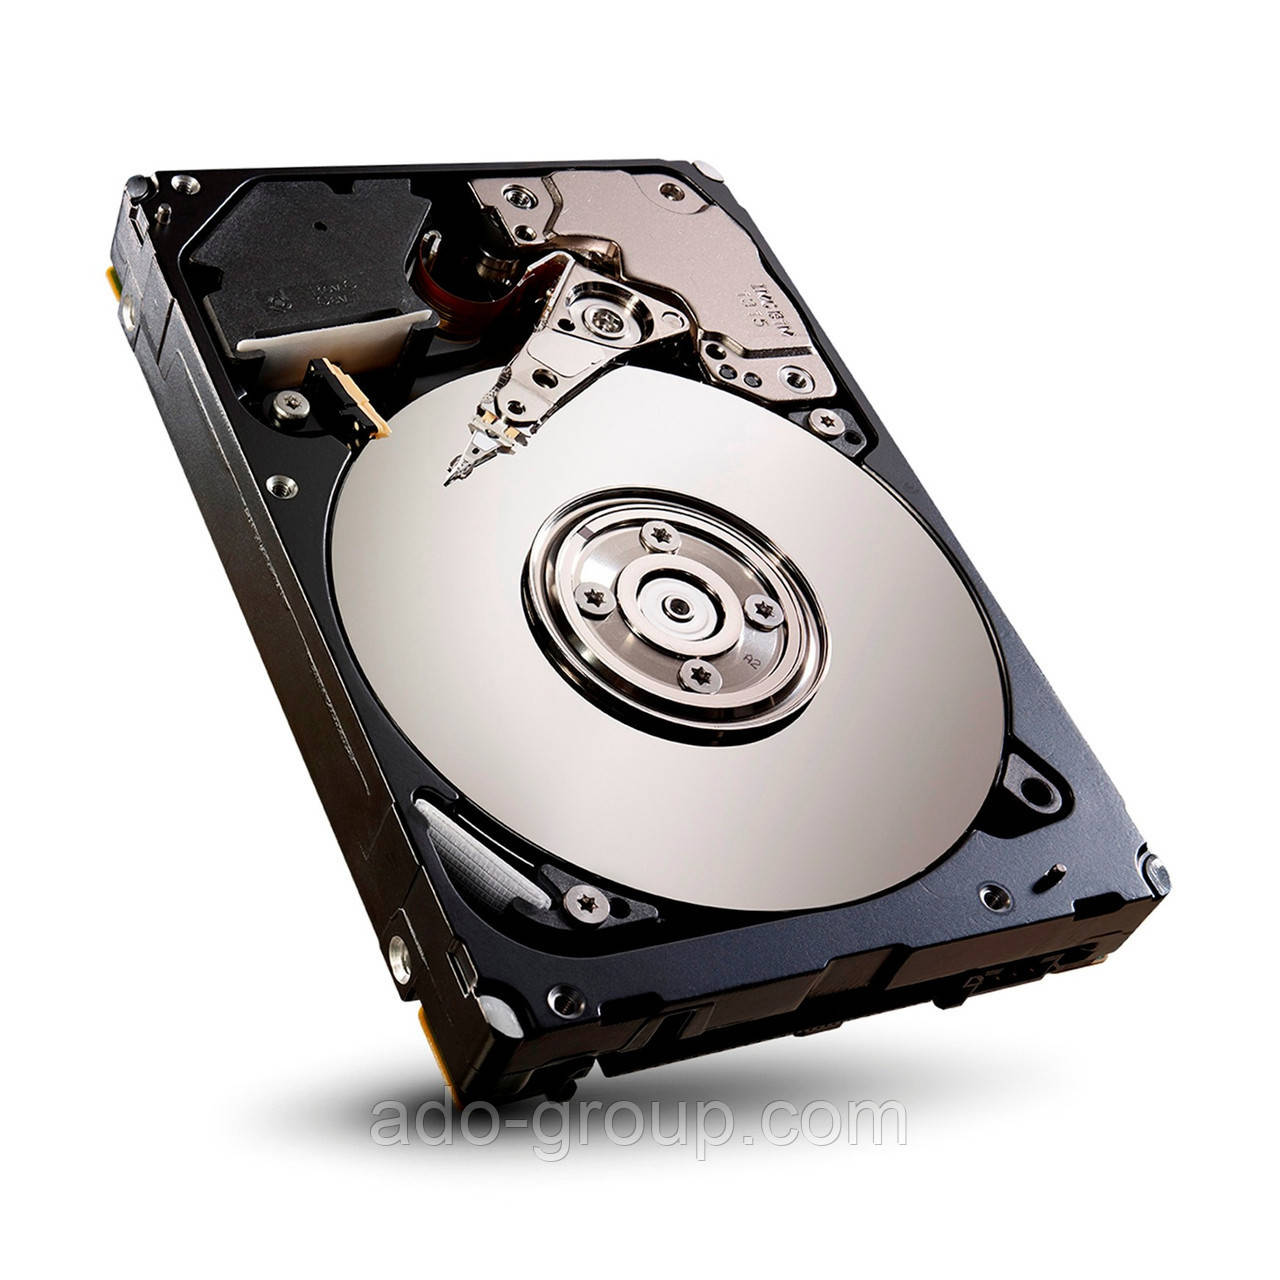 "GX198 Жесткий диск Dell 146GB SAS 15K  3.5"" +"